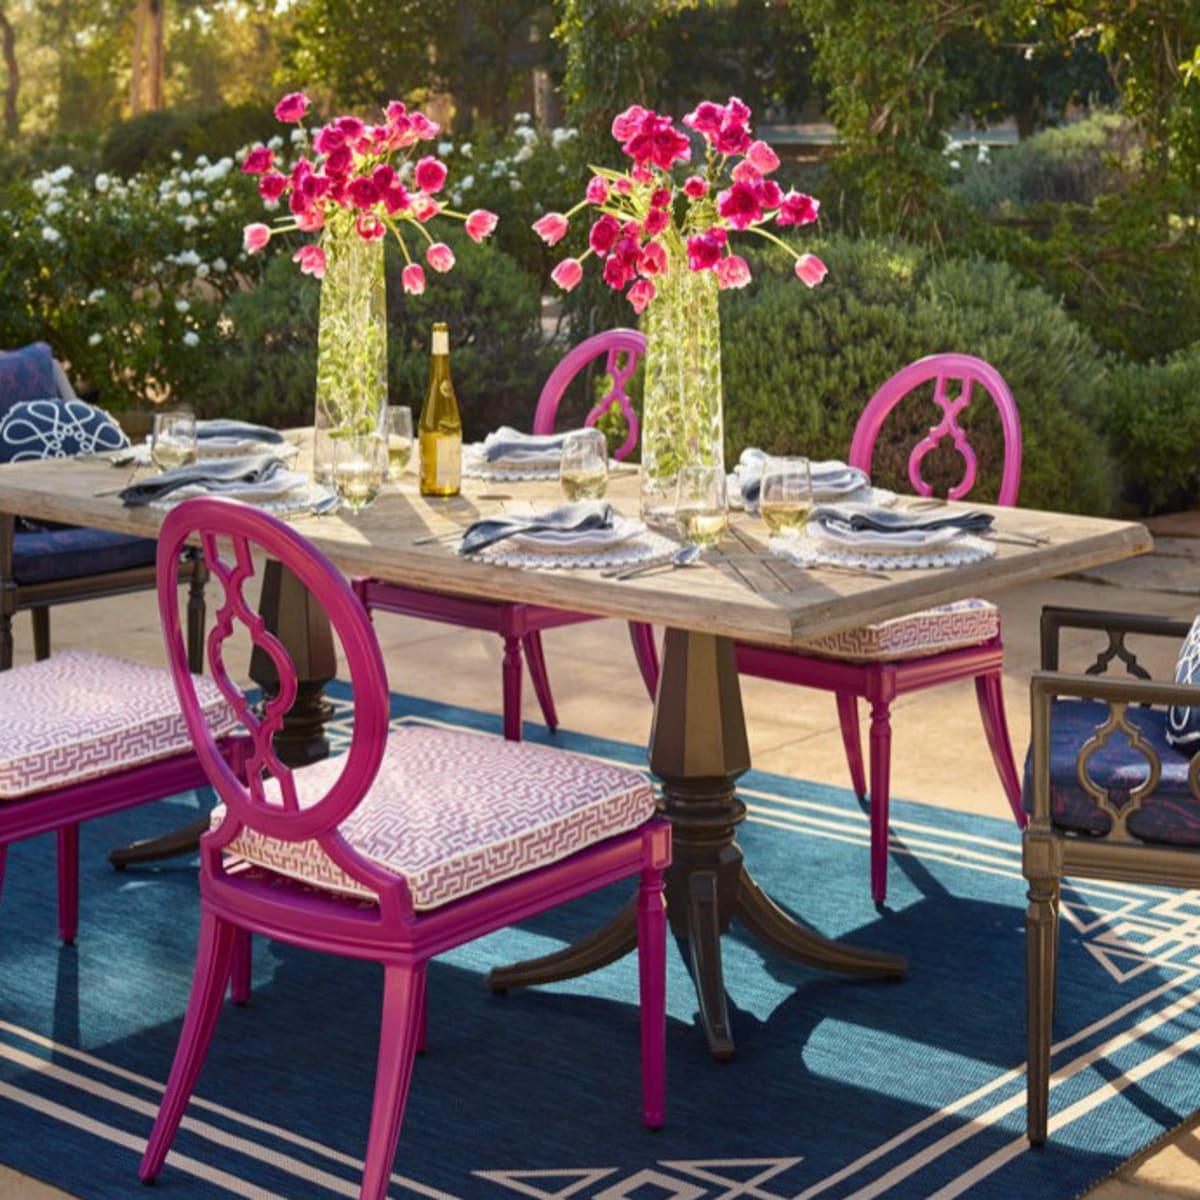 Take A Peek Inside Frontgate's New Home Decor Wonderland